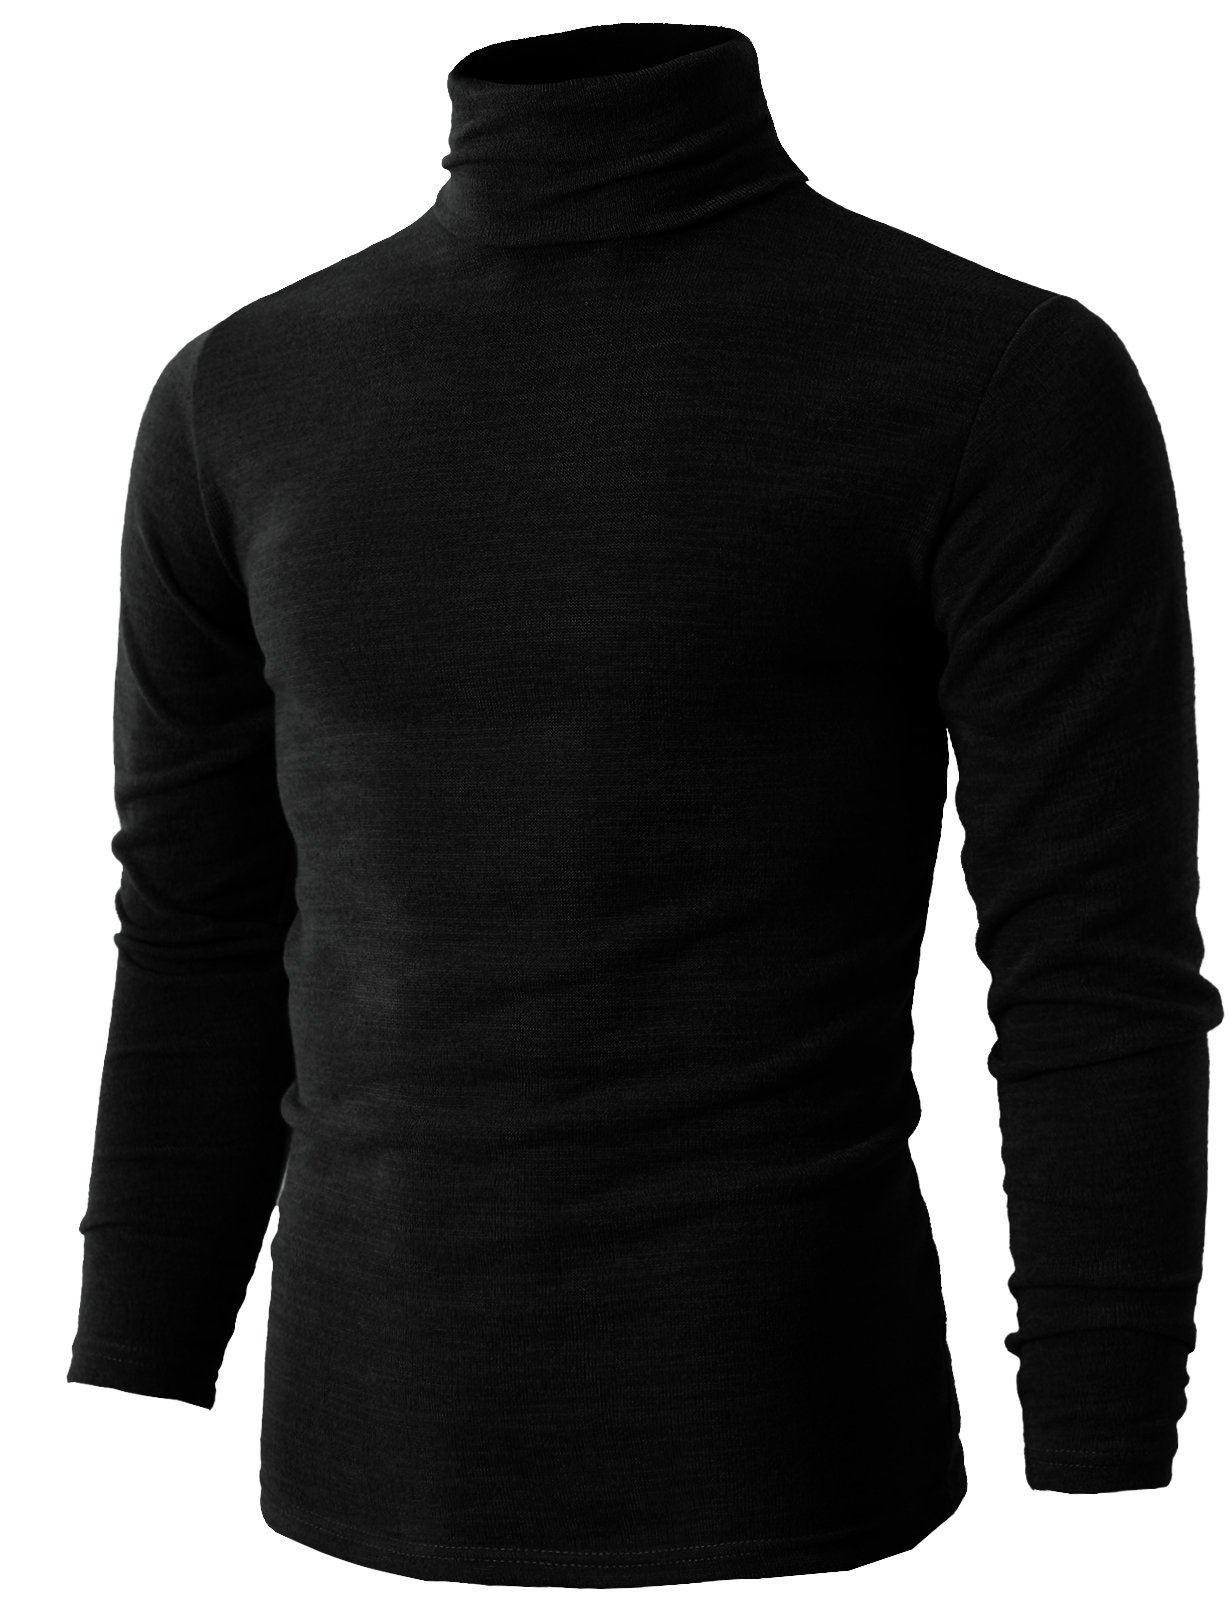 H2H mens black turtleneck sweater BLACK US L/Asia 3XL (KMTTL028)